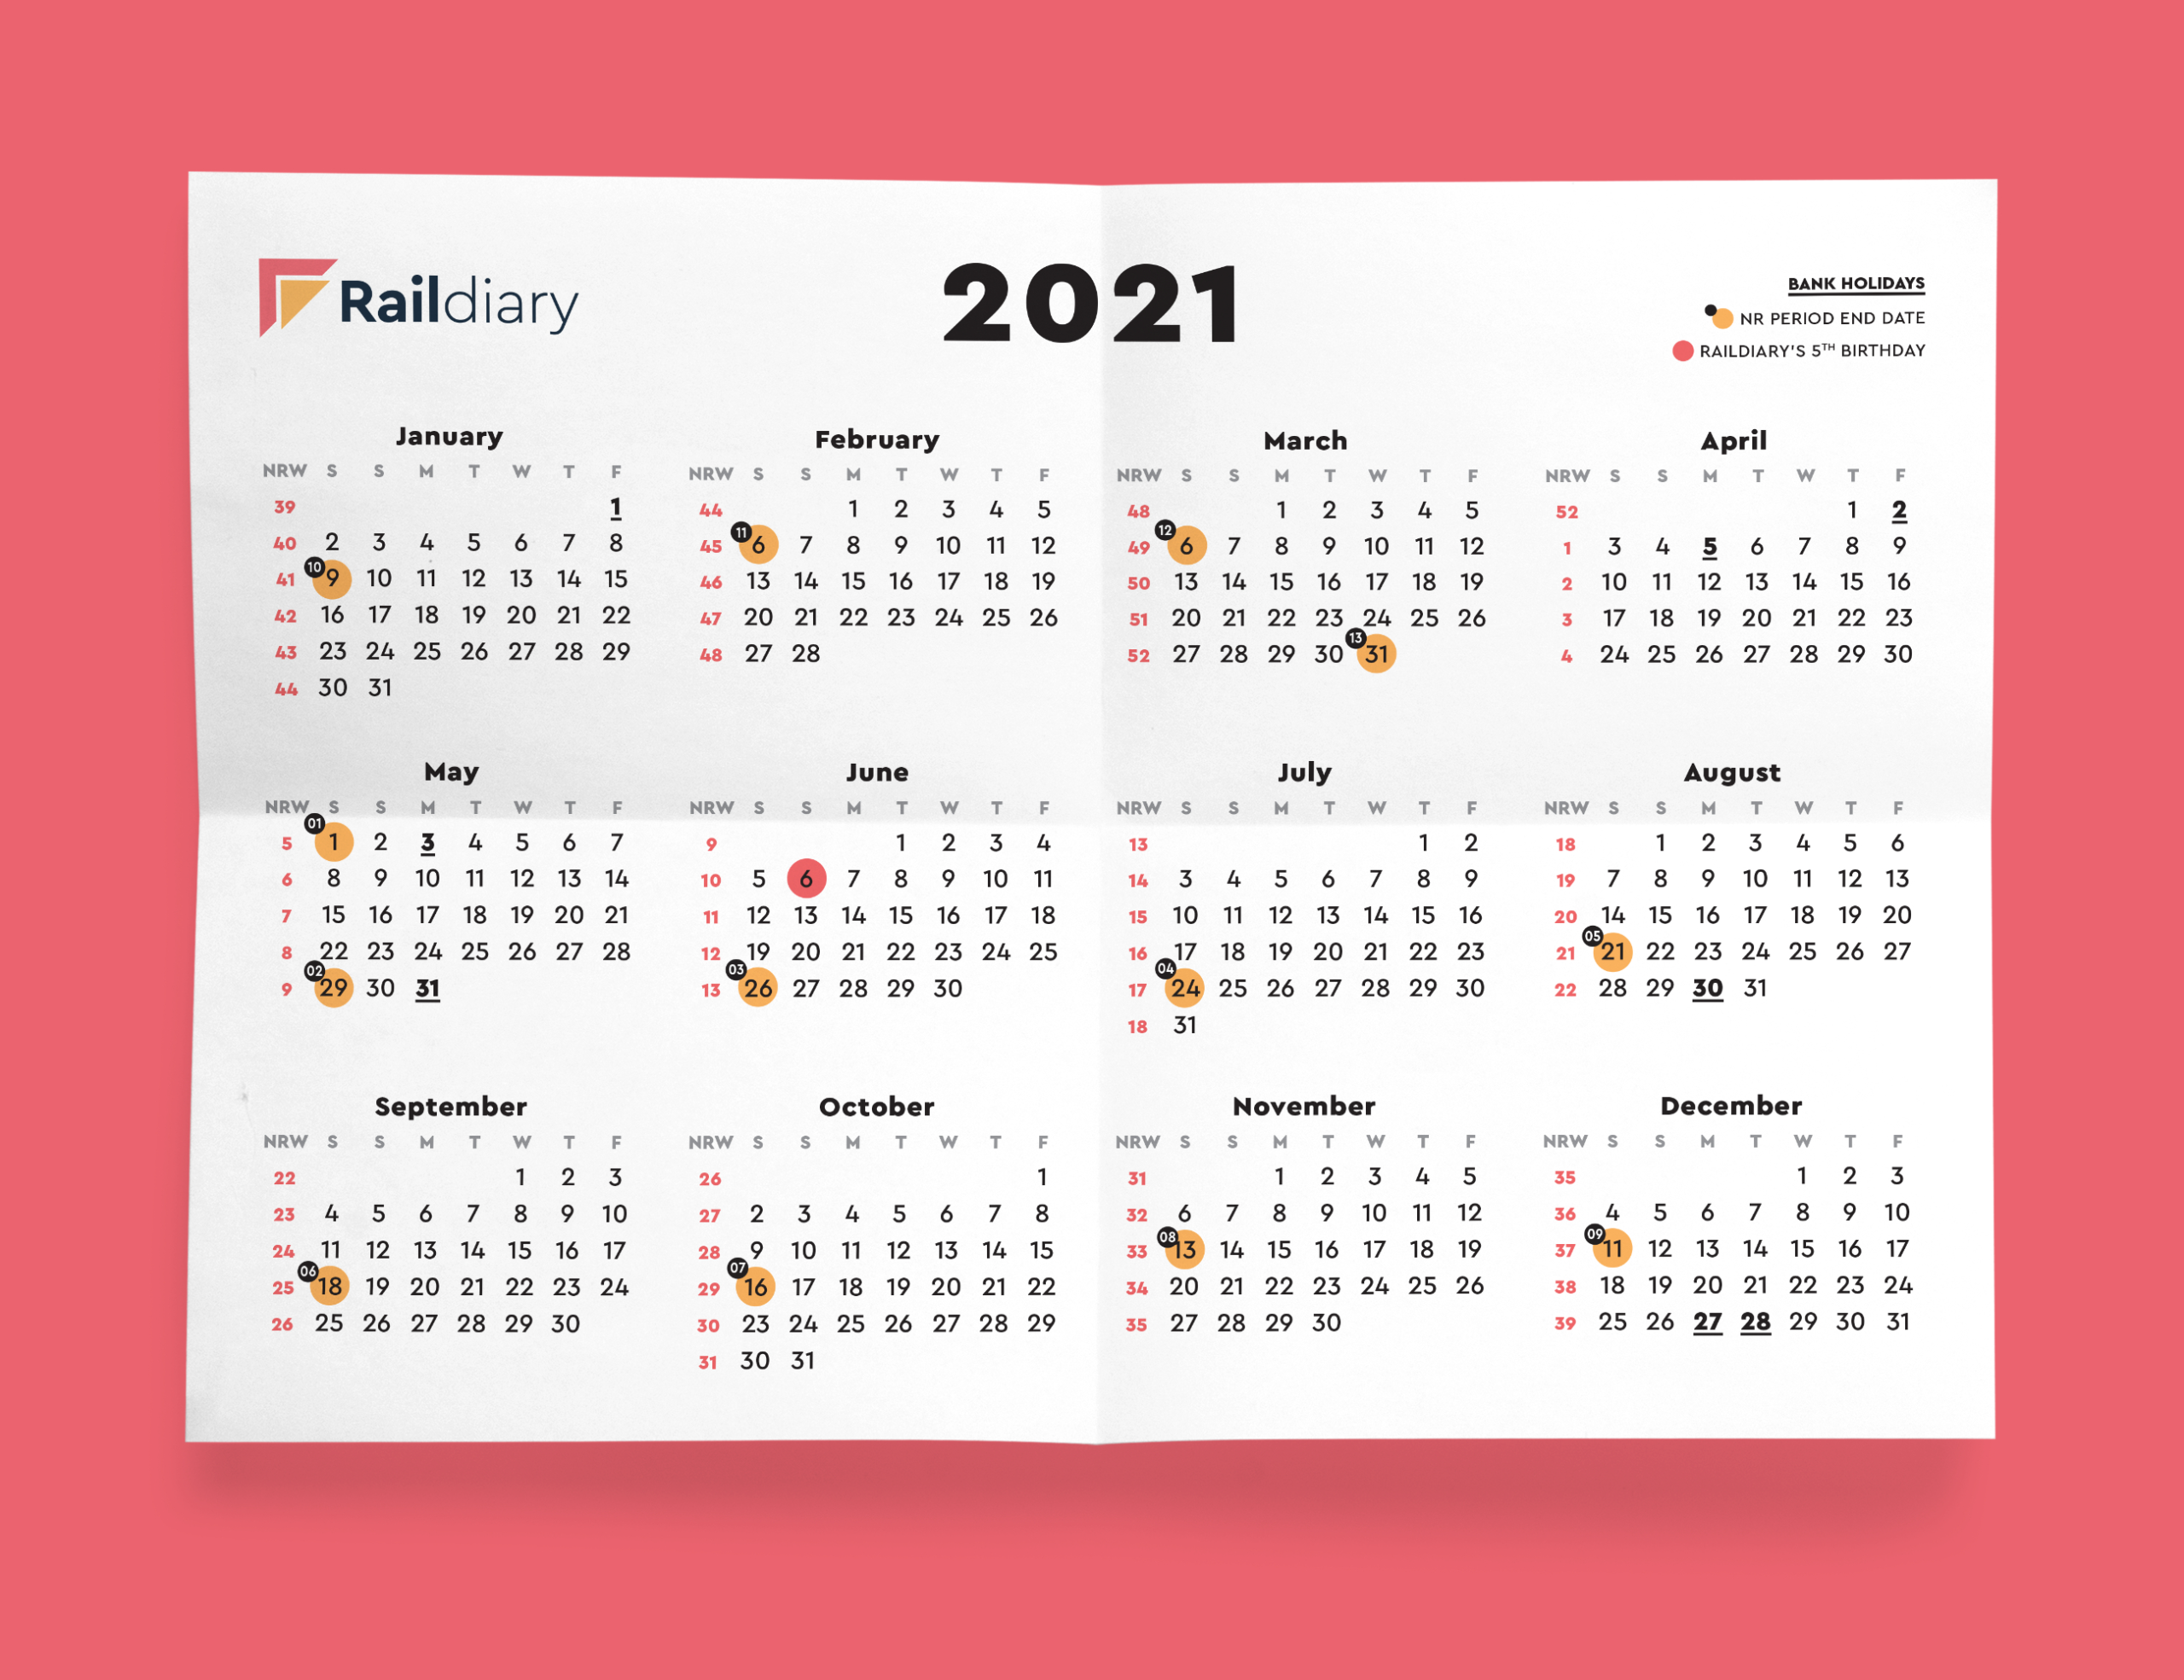 Rail Calendar 2021 for Weekly Planner For 2021- 52 Weeks